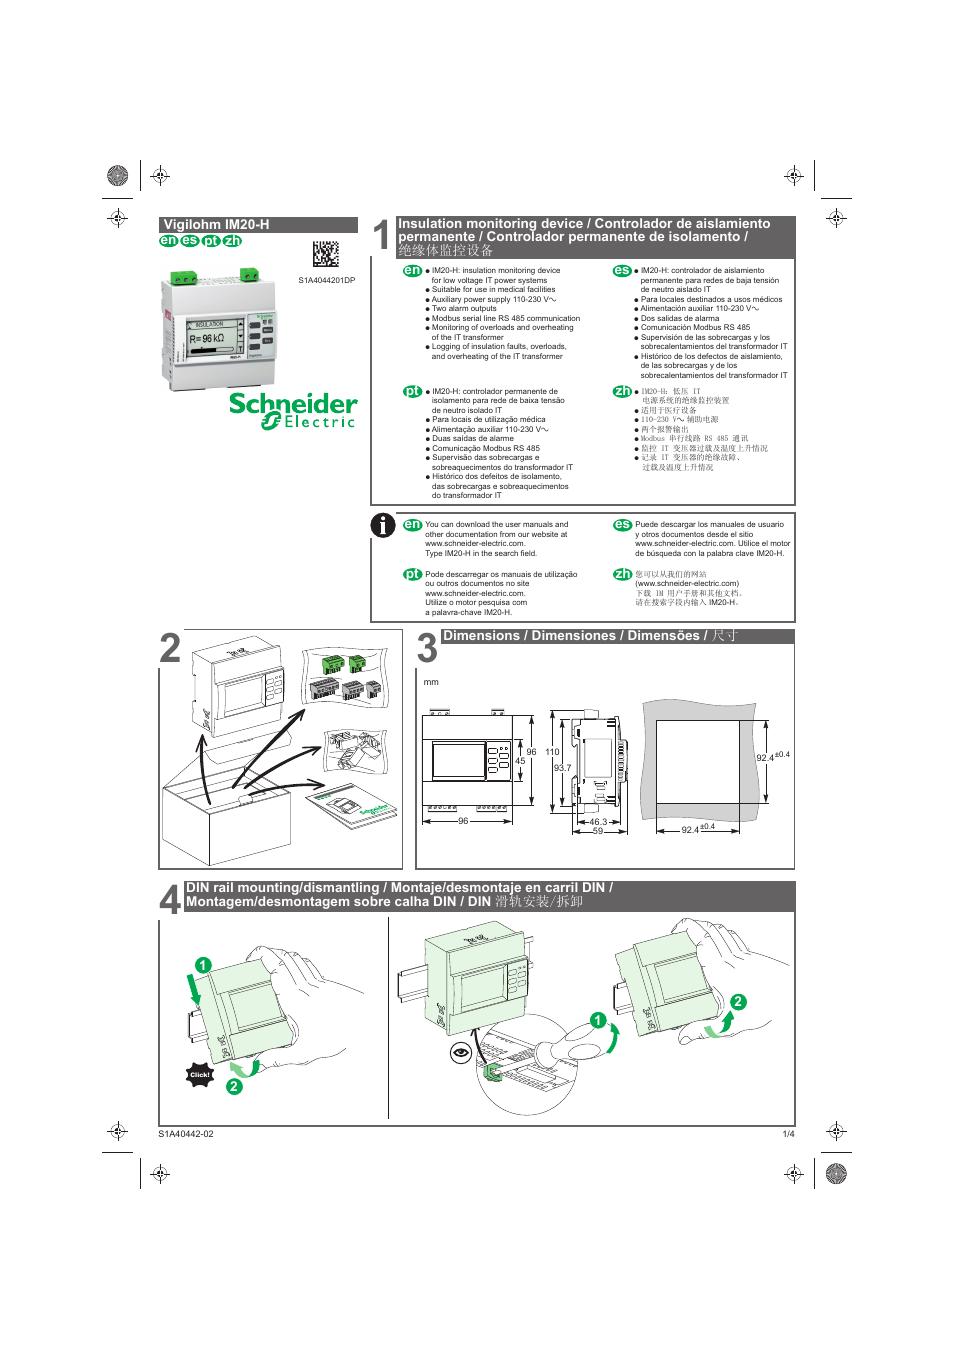 Schneider Electric Vigilohm IM20-H User Manual   10 pages